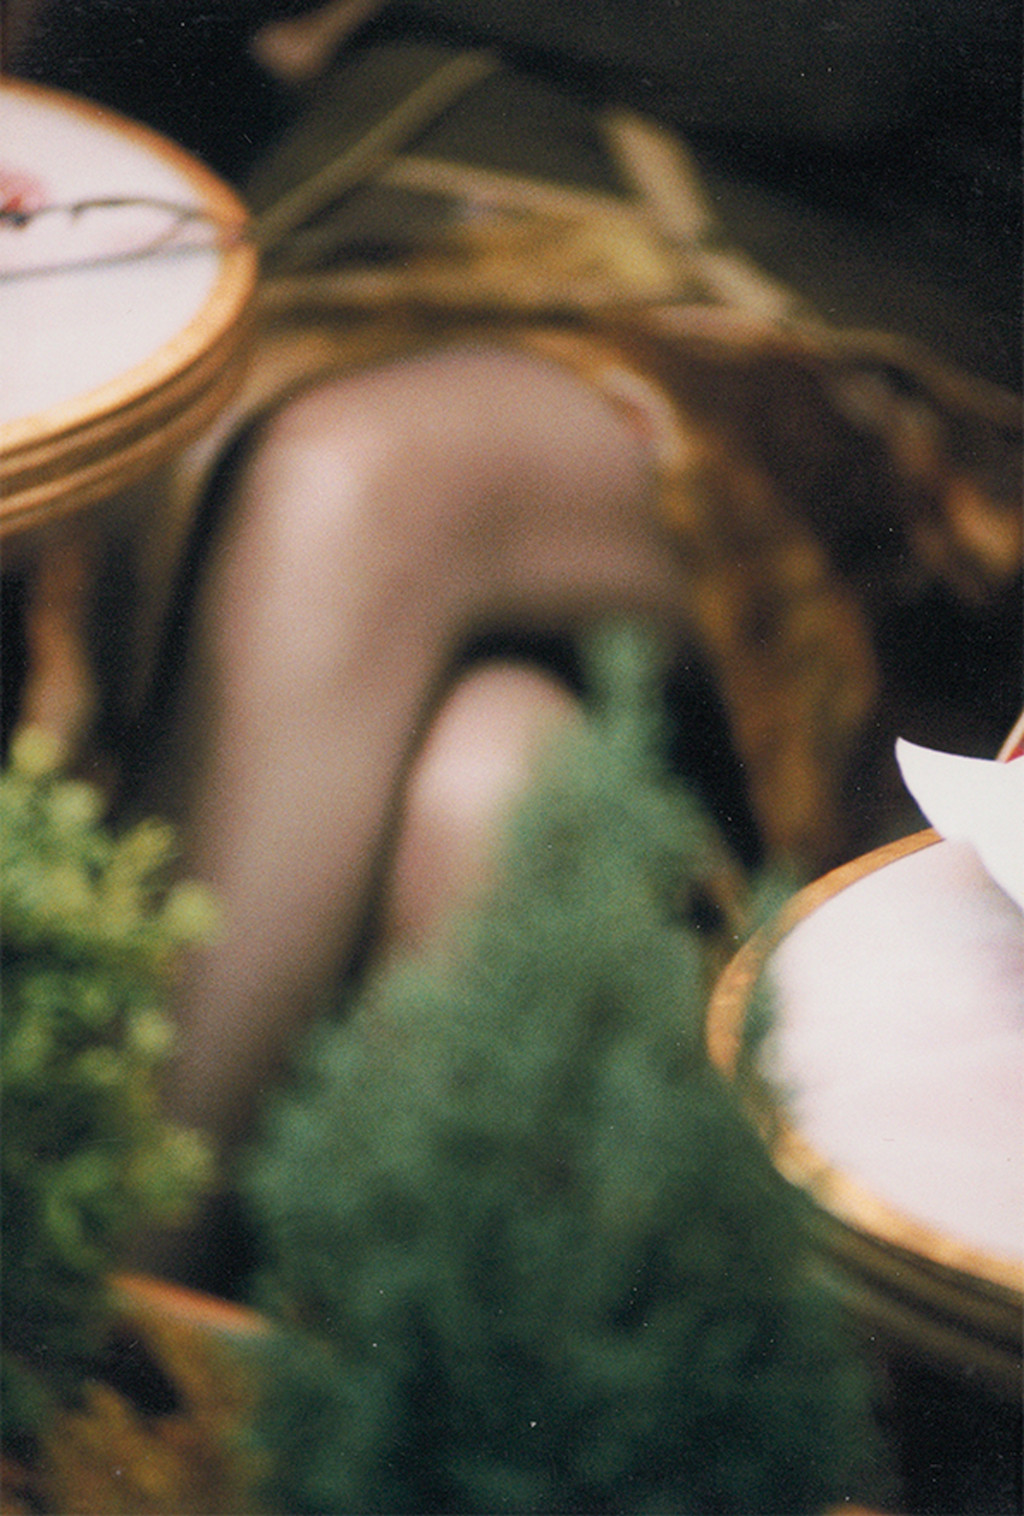 Table ronde - © christian berst — art brut